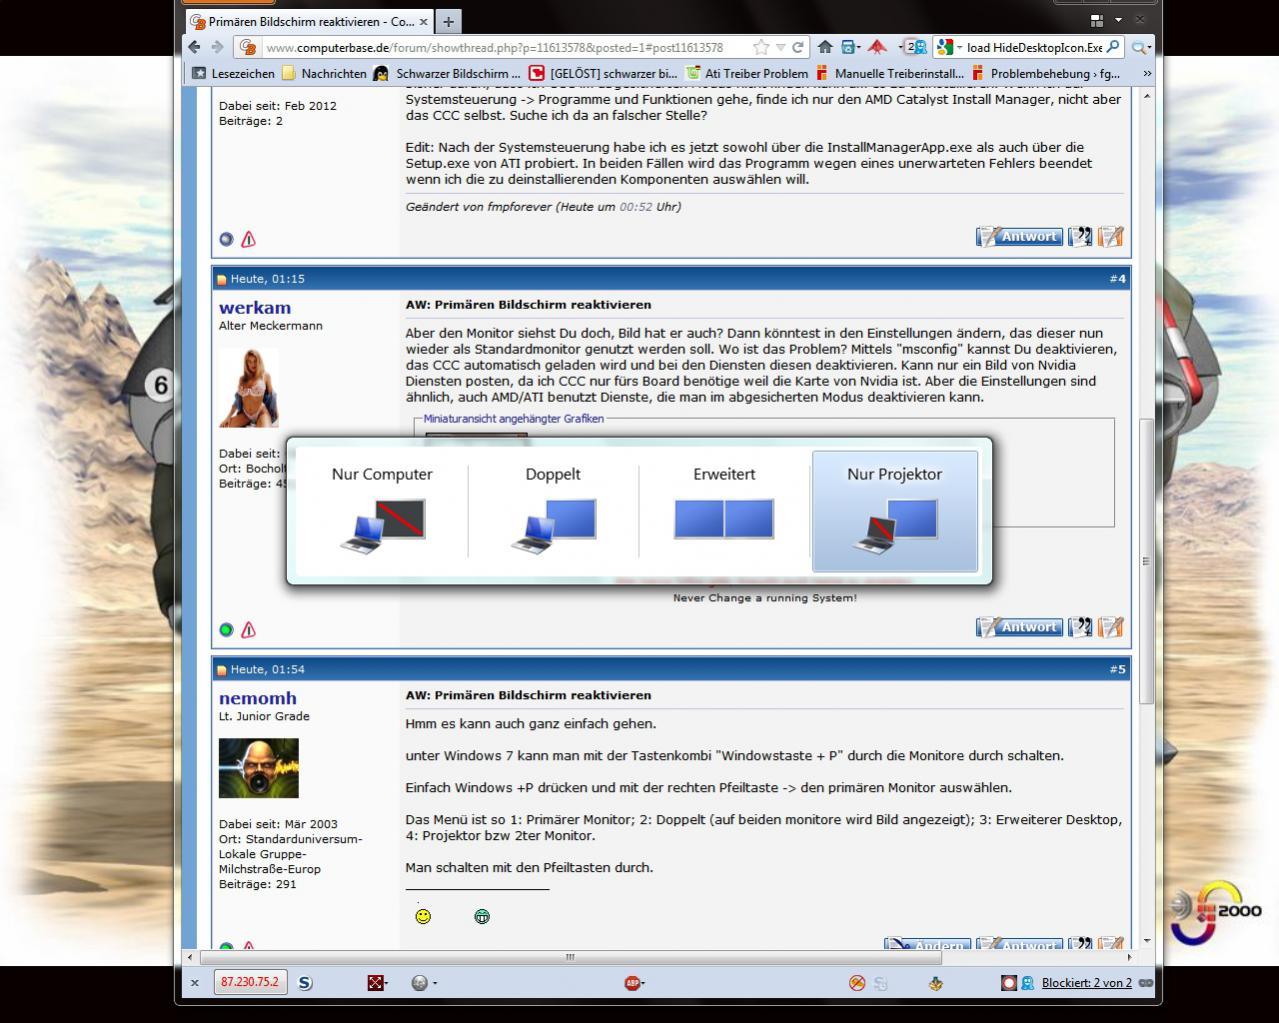 Primären Bildschirm reaktivieren  ComputerBase Forum